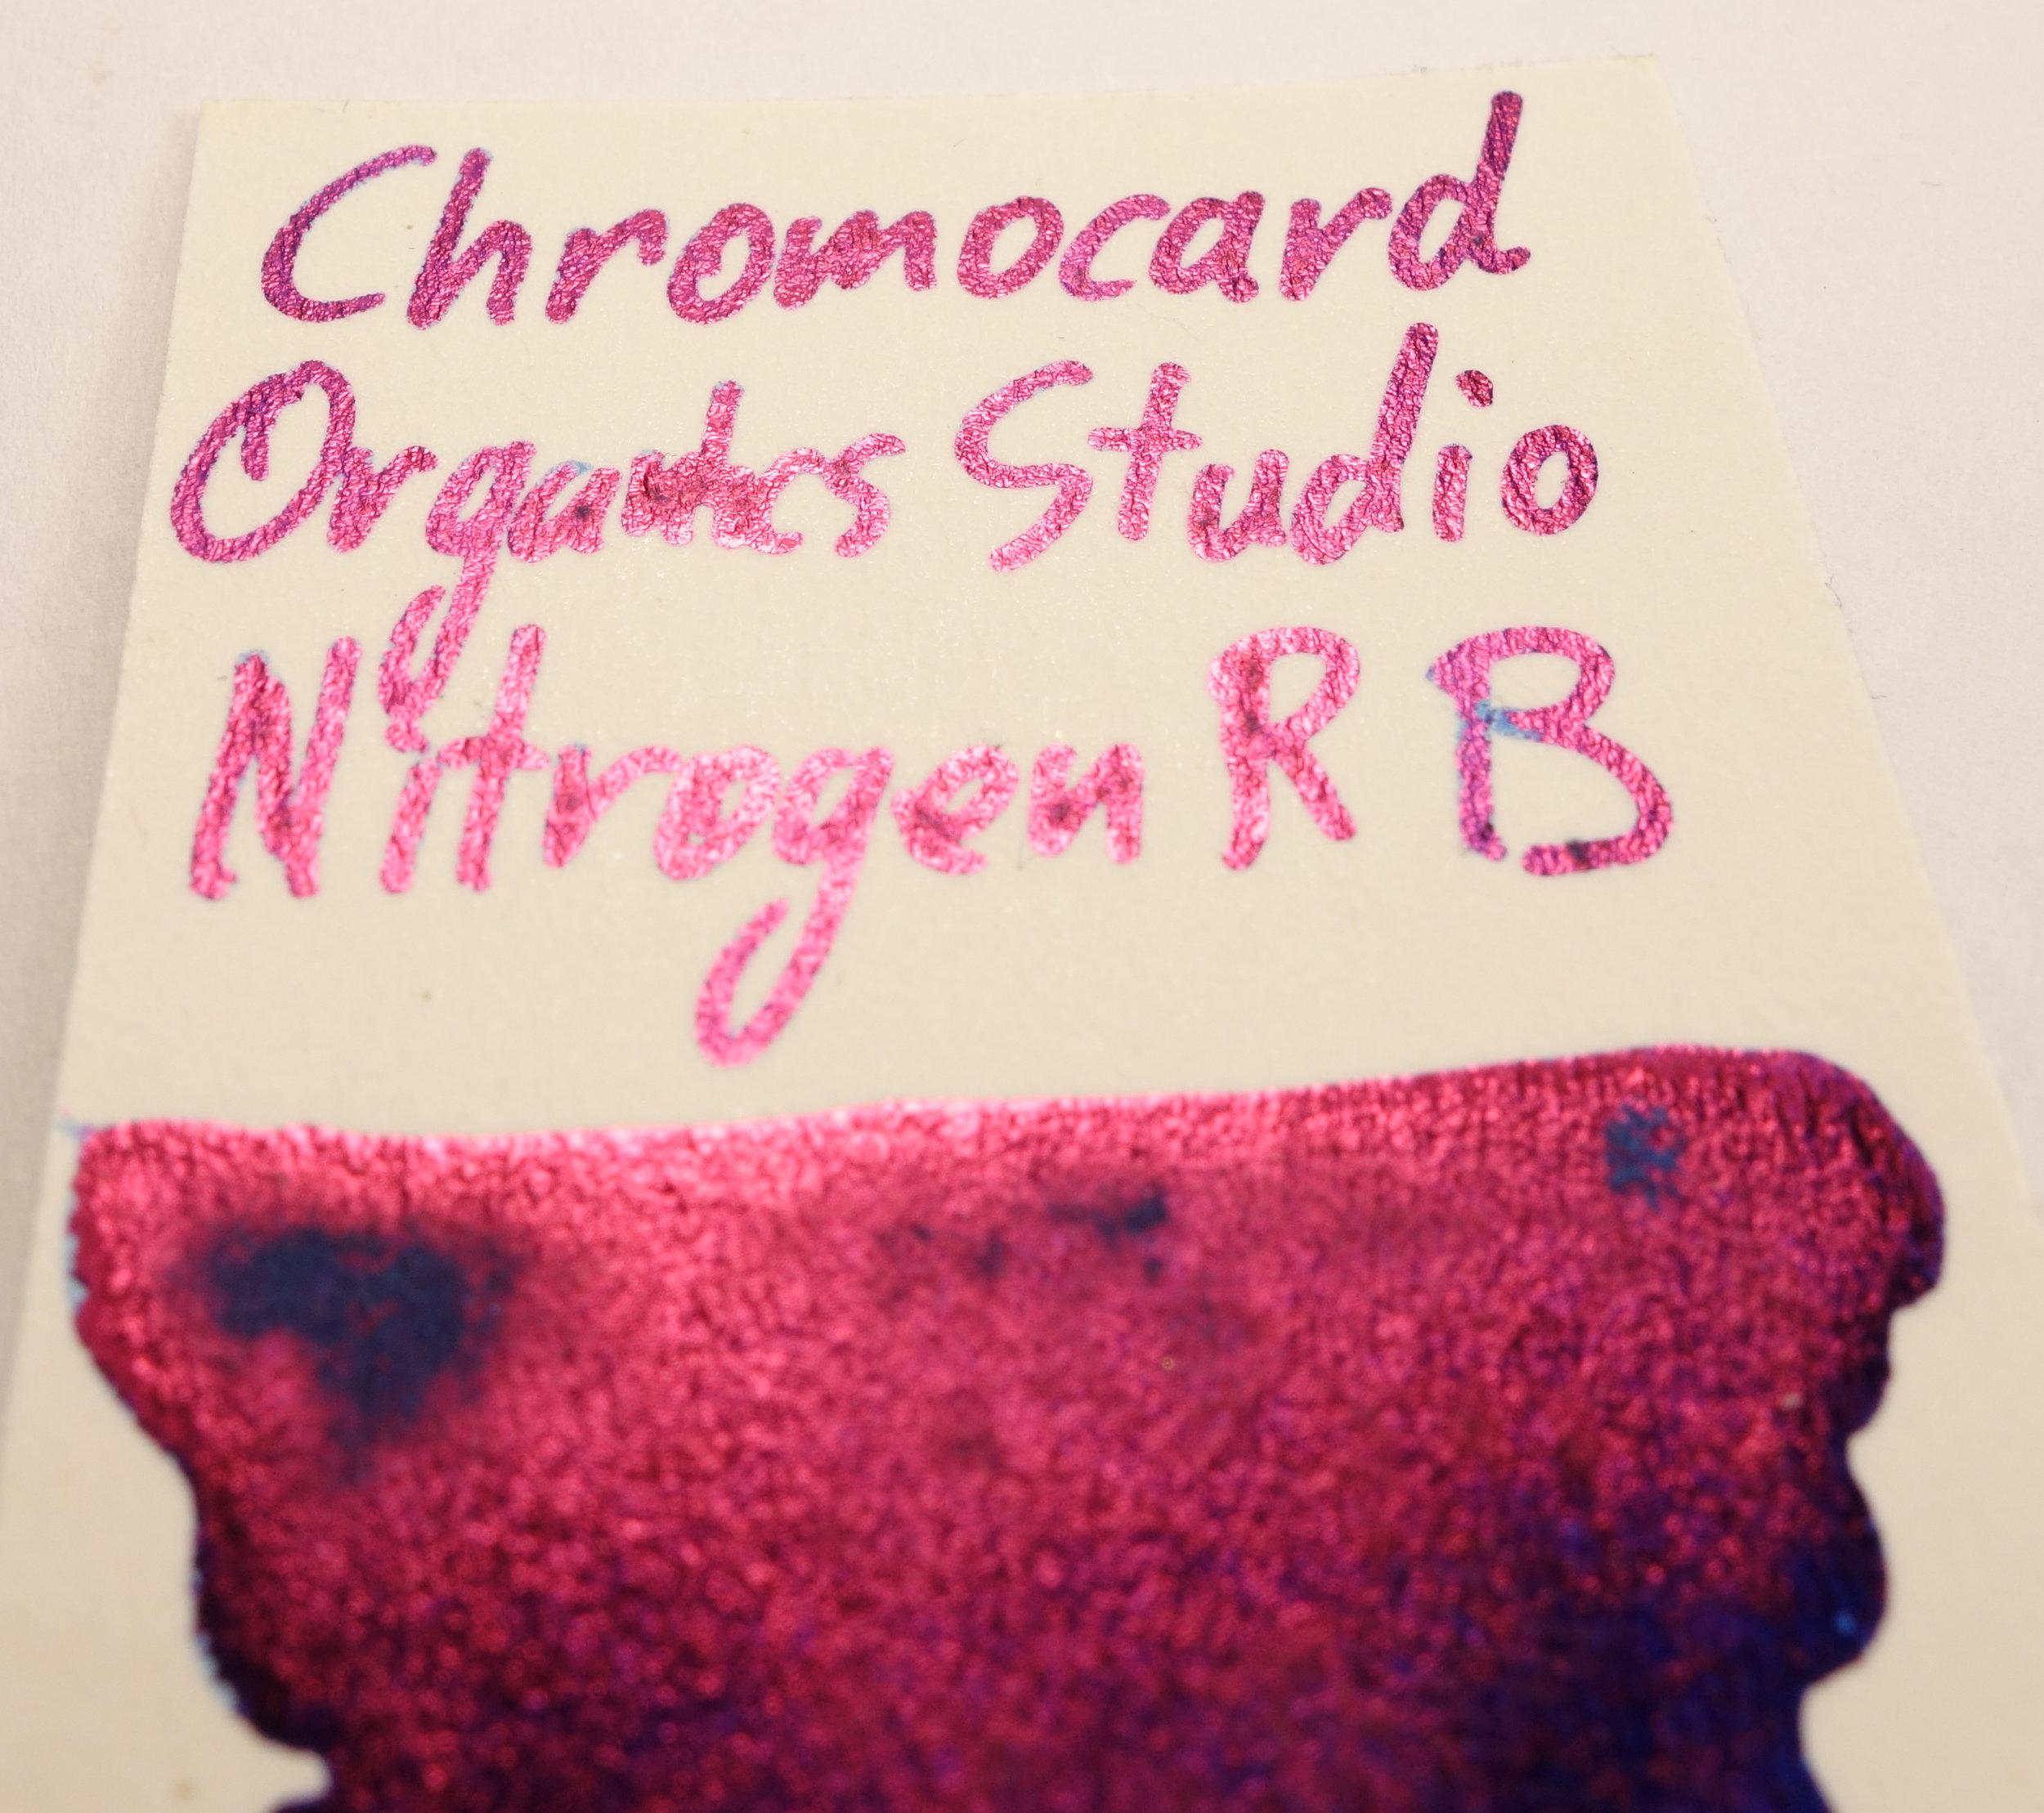 Organics Studio Nitrogen Royal Blue Sheen Chromocard.JPG